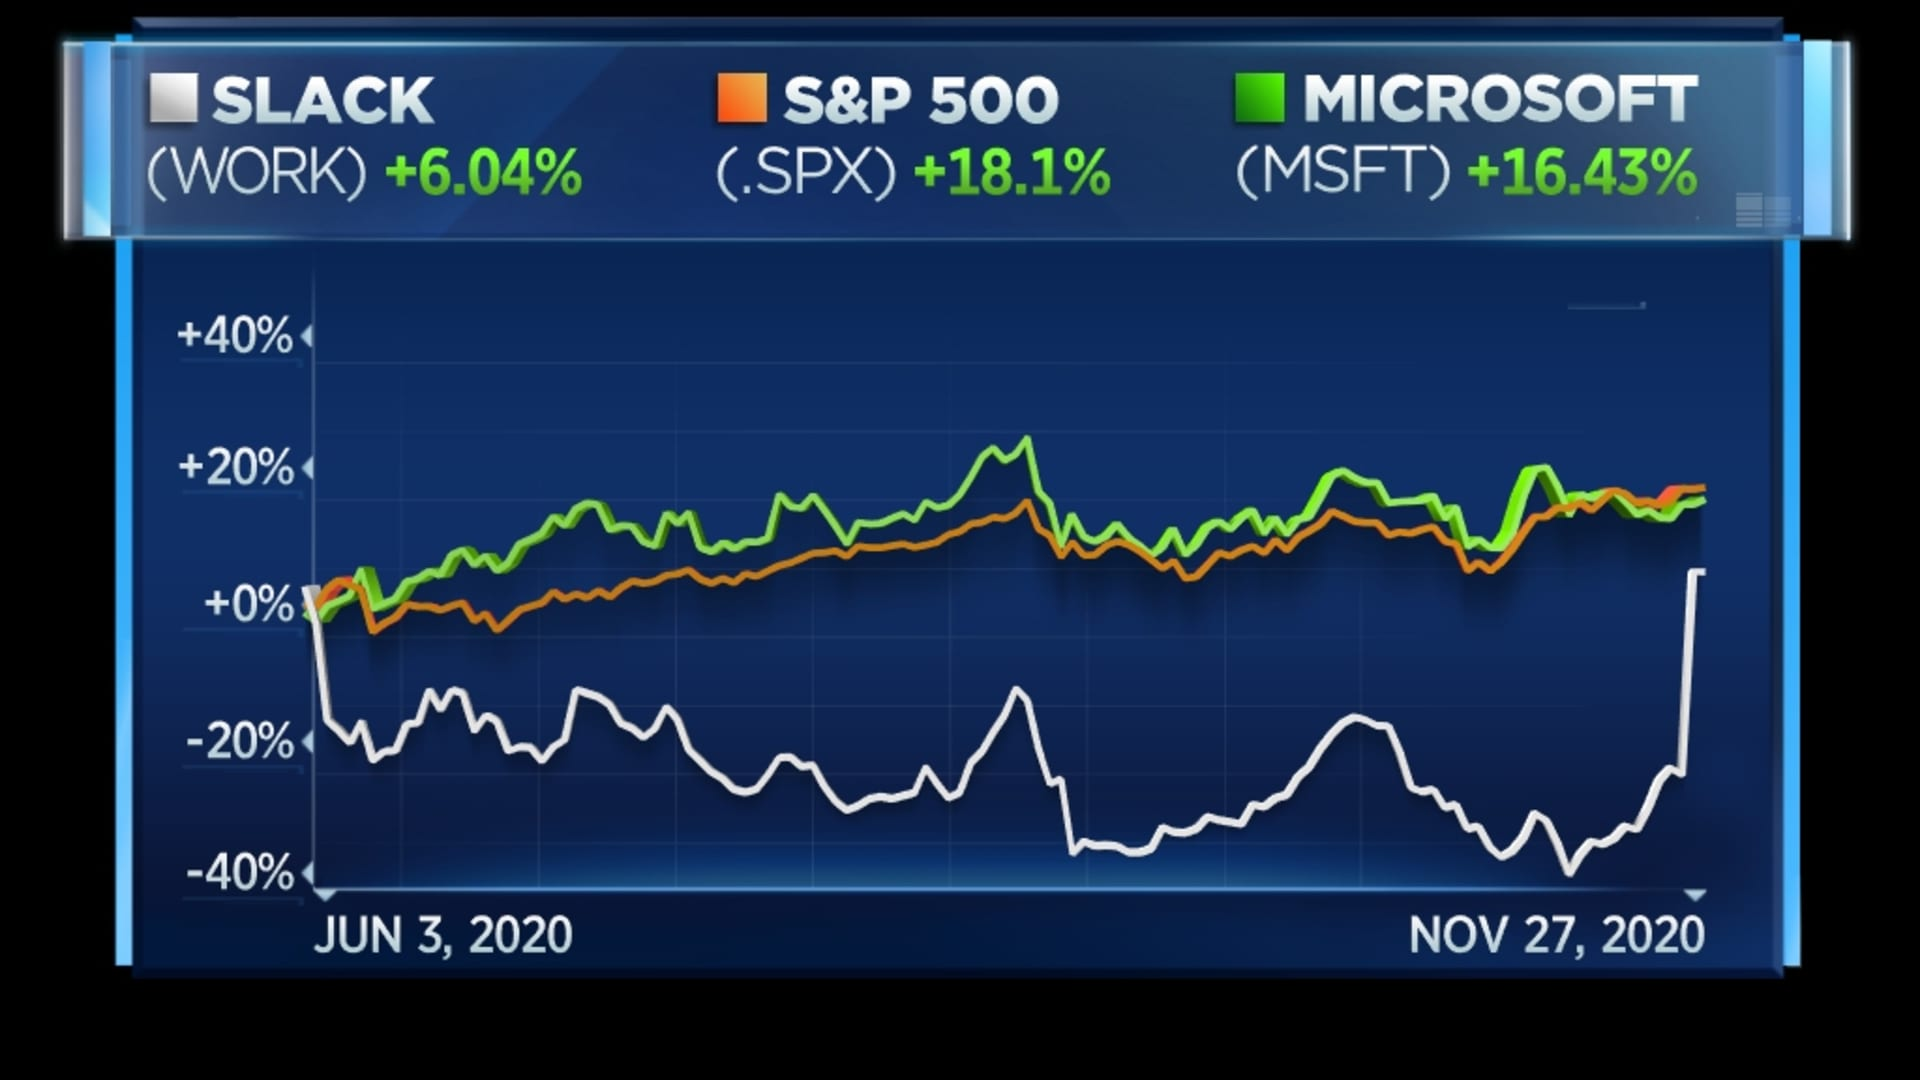 Slack vs. Microsoft and S&P 500